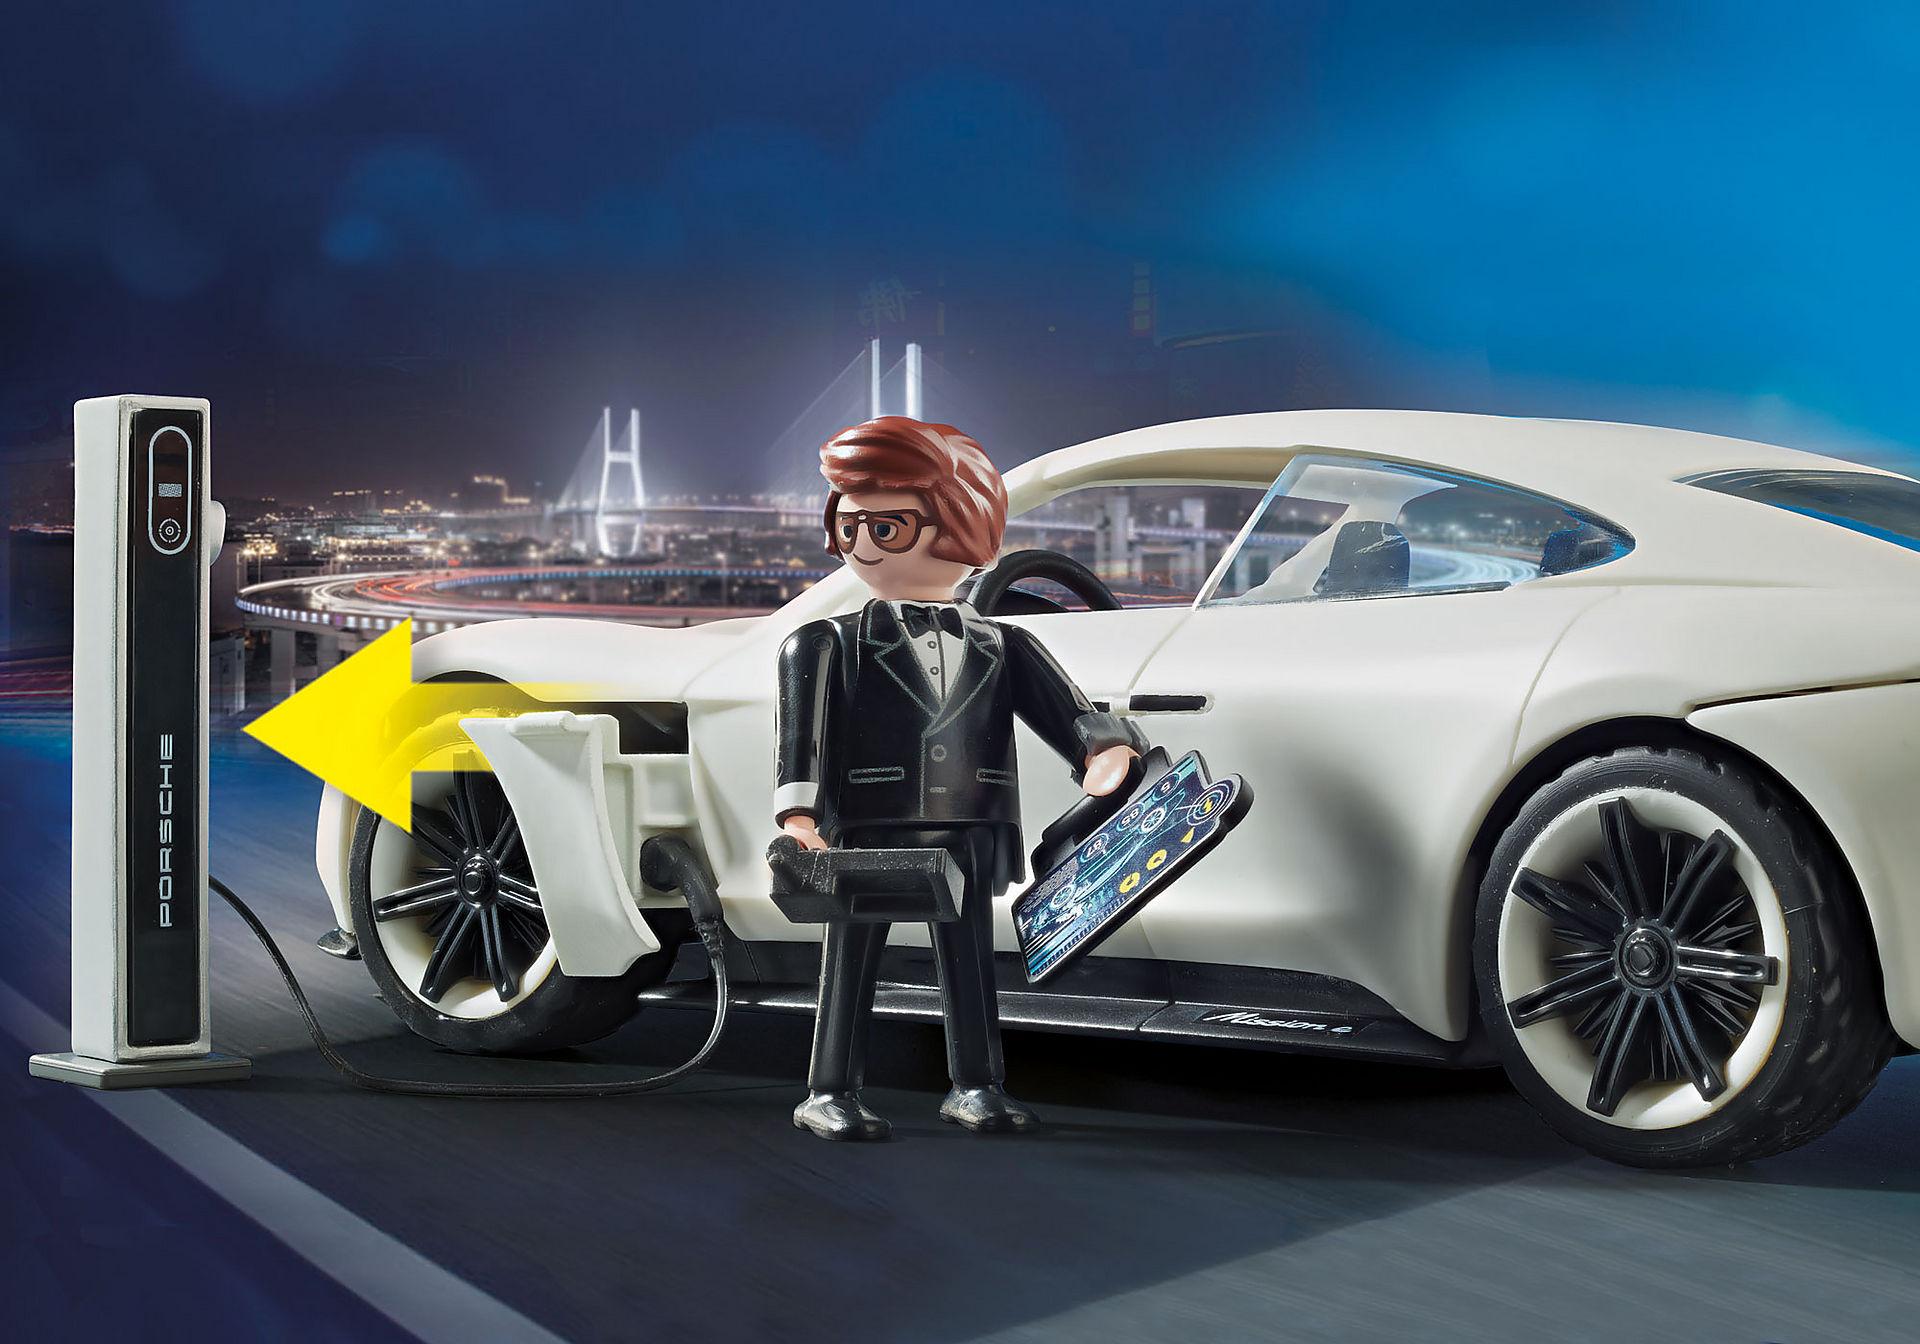 http://media.playmobil.com/i/playmobil/70078_product_extra1/PLAYMOBIL:THE MOVIE Rex Dasher's Porsche Mission E